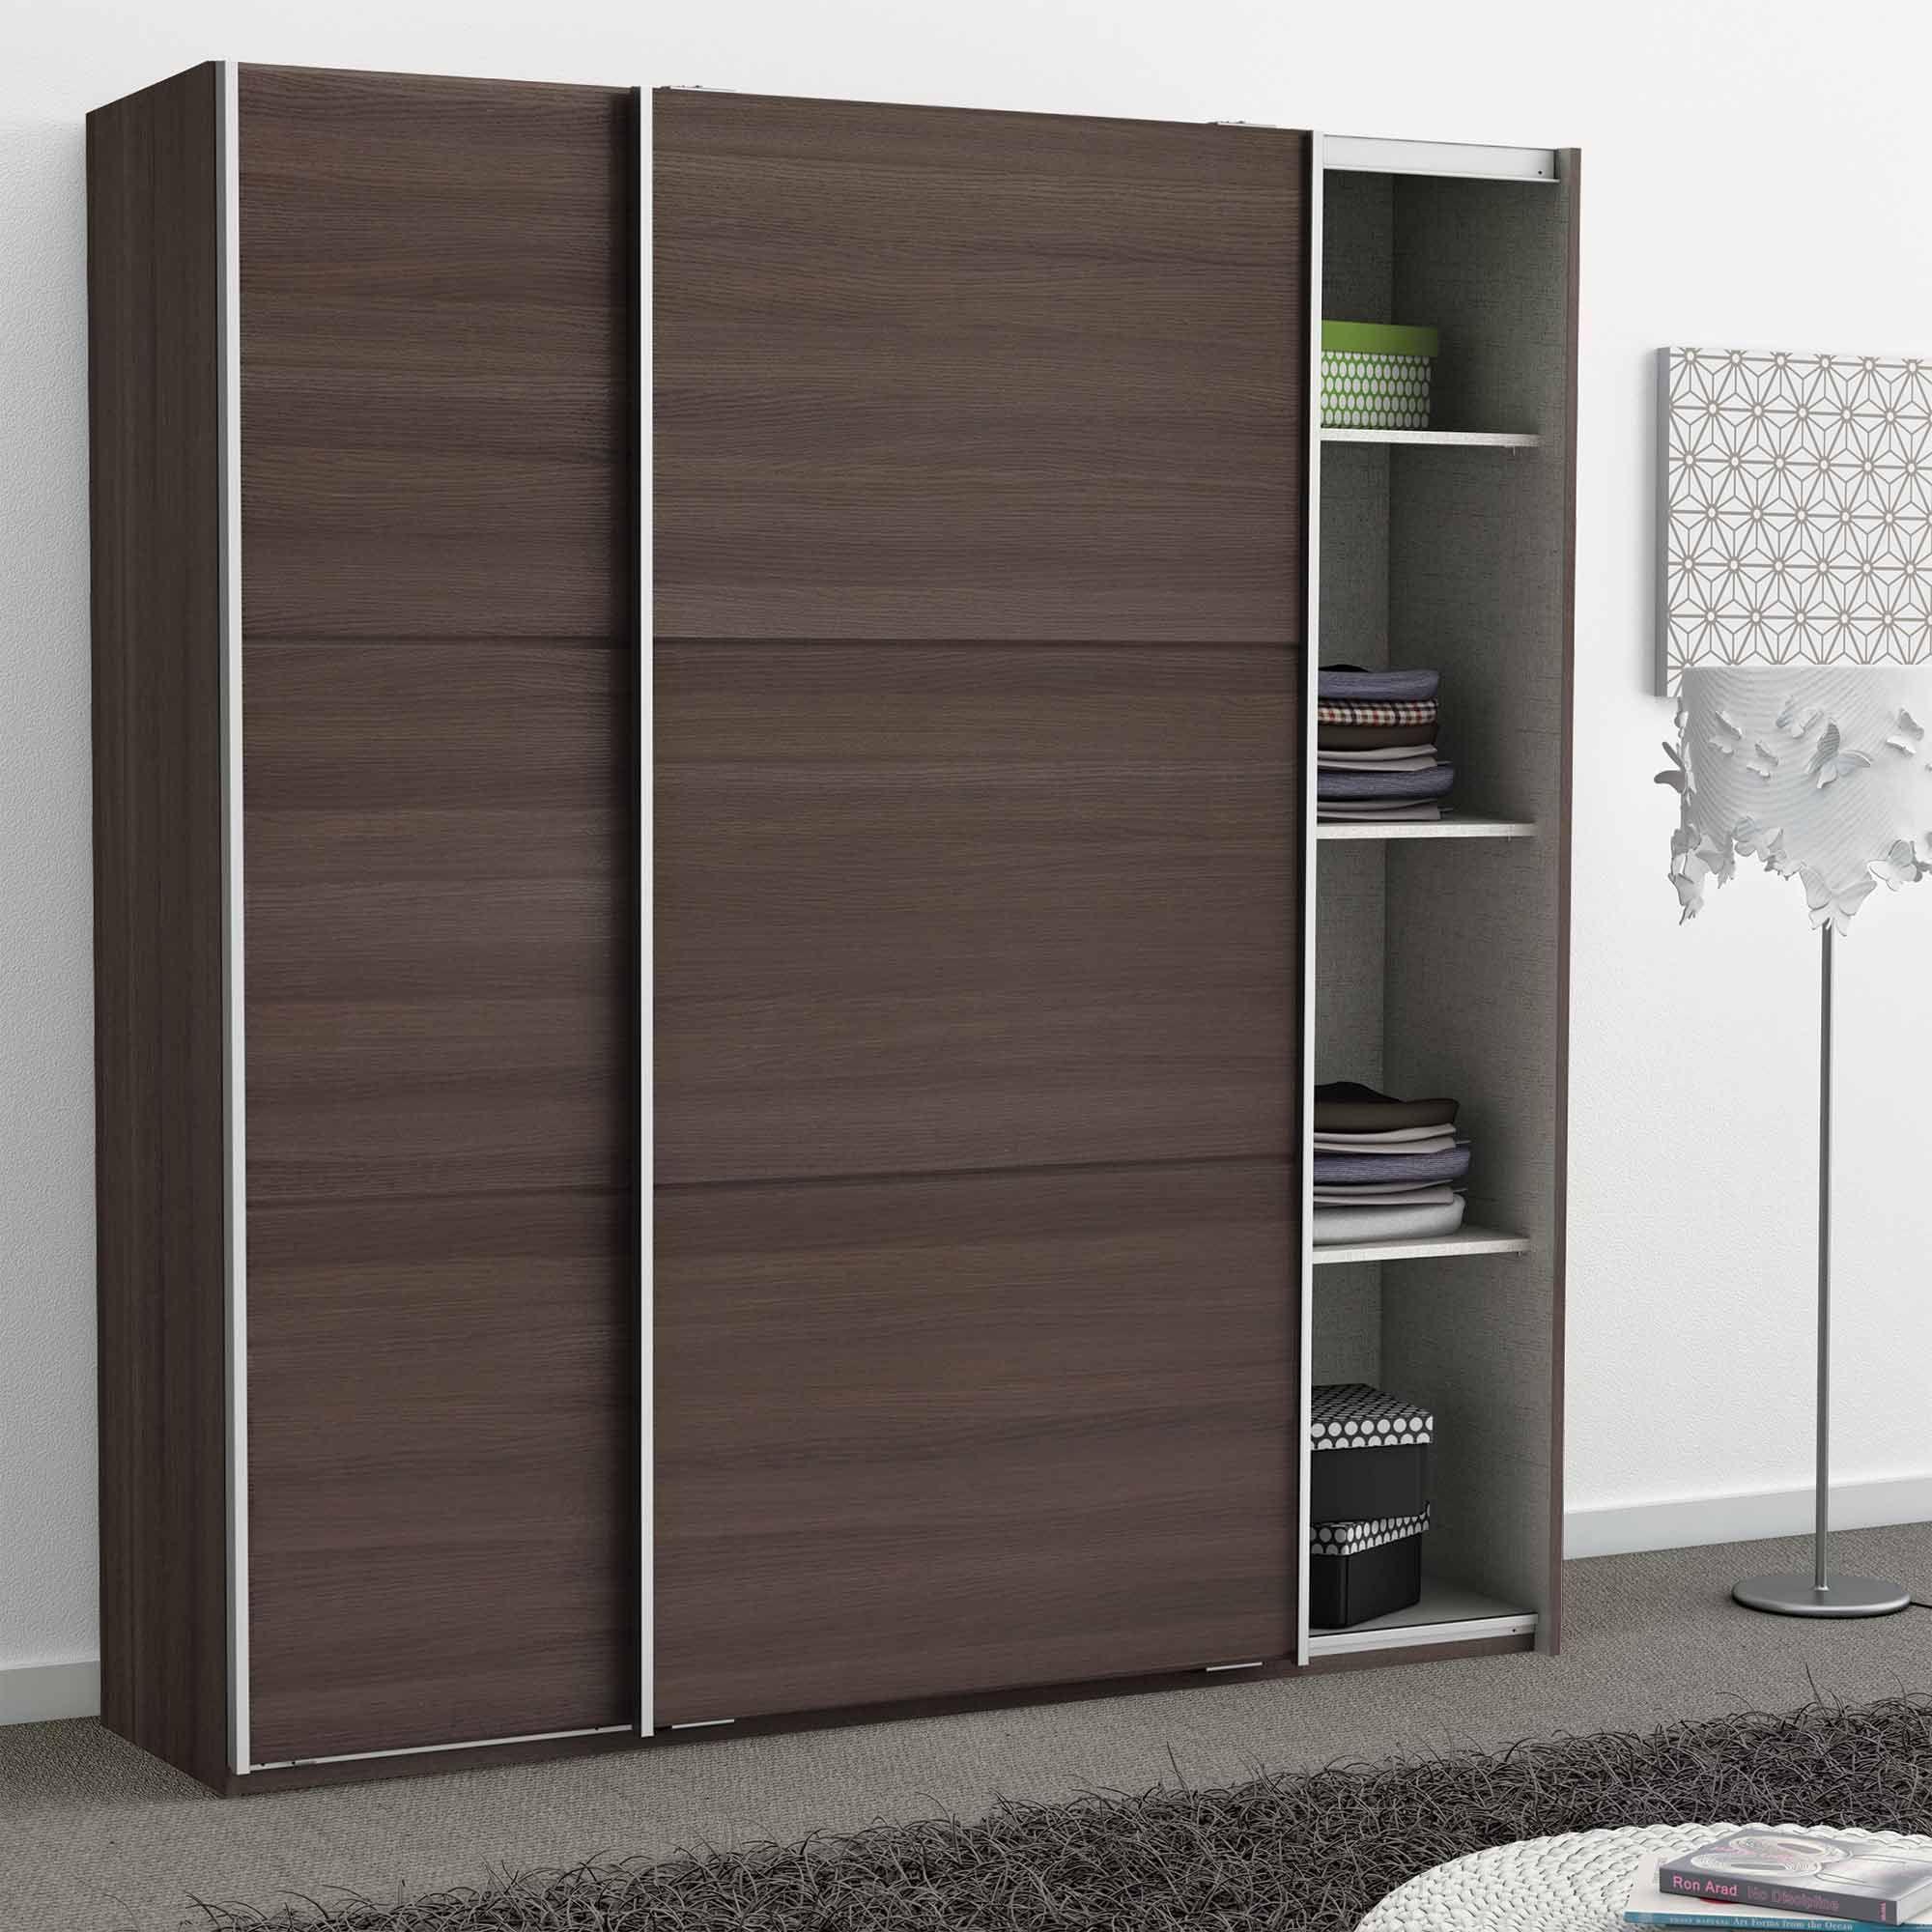 Armoire En Bois 2 Portes Coulissantes Stella Tall Cabinet Storage Transforming Furniture Reupholster Furniture